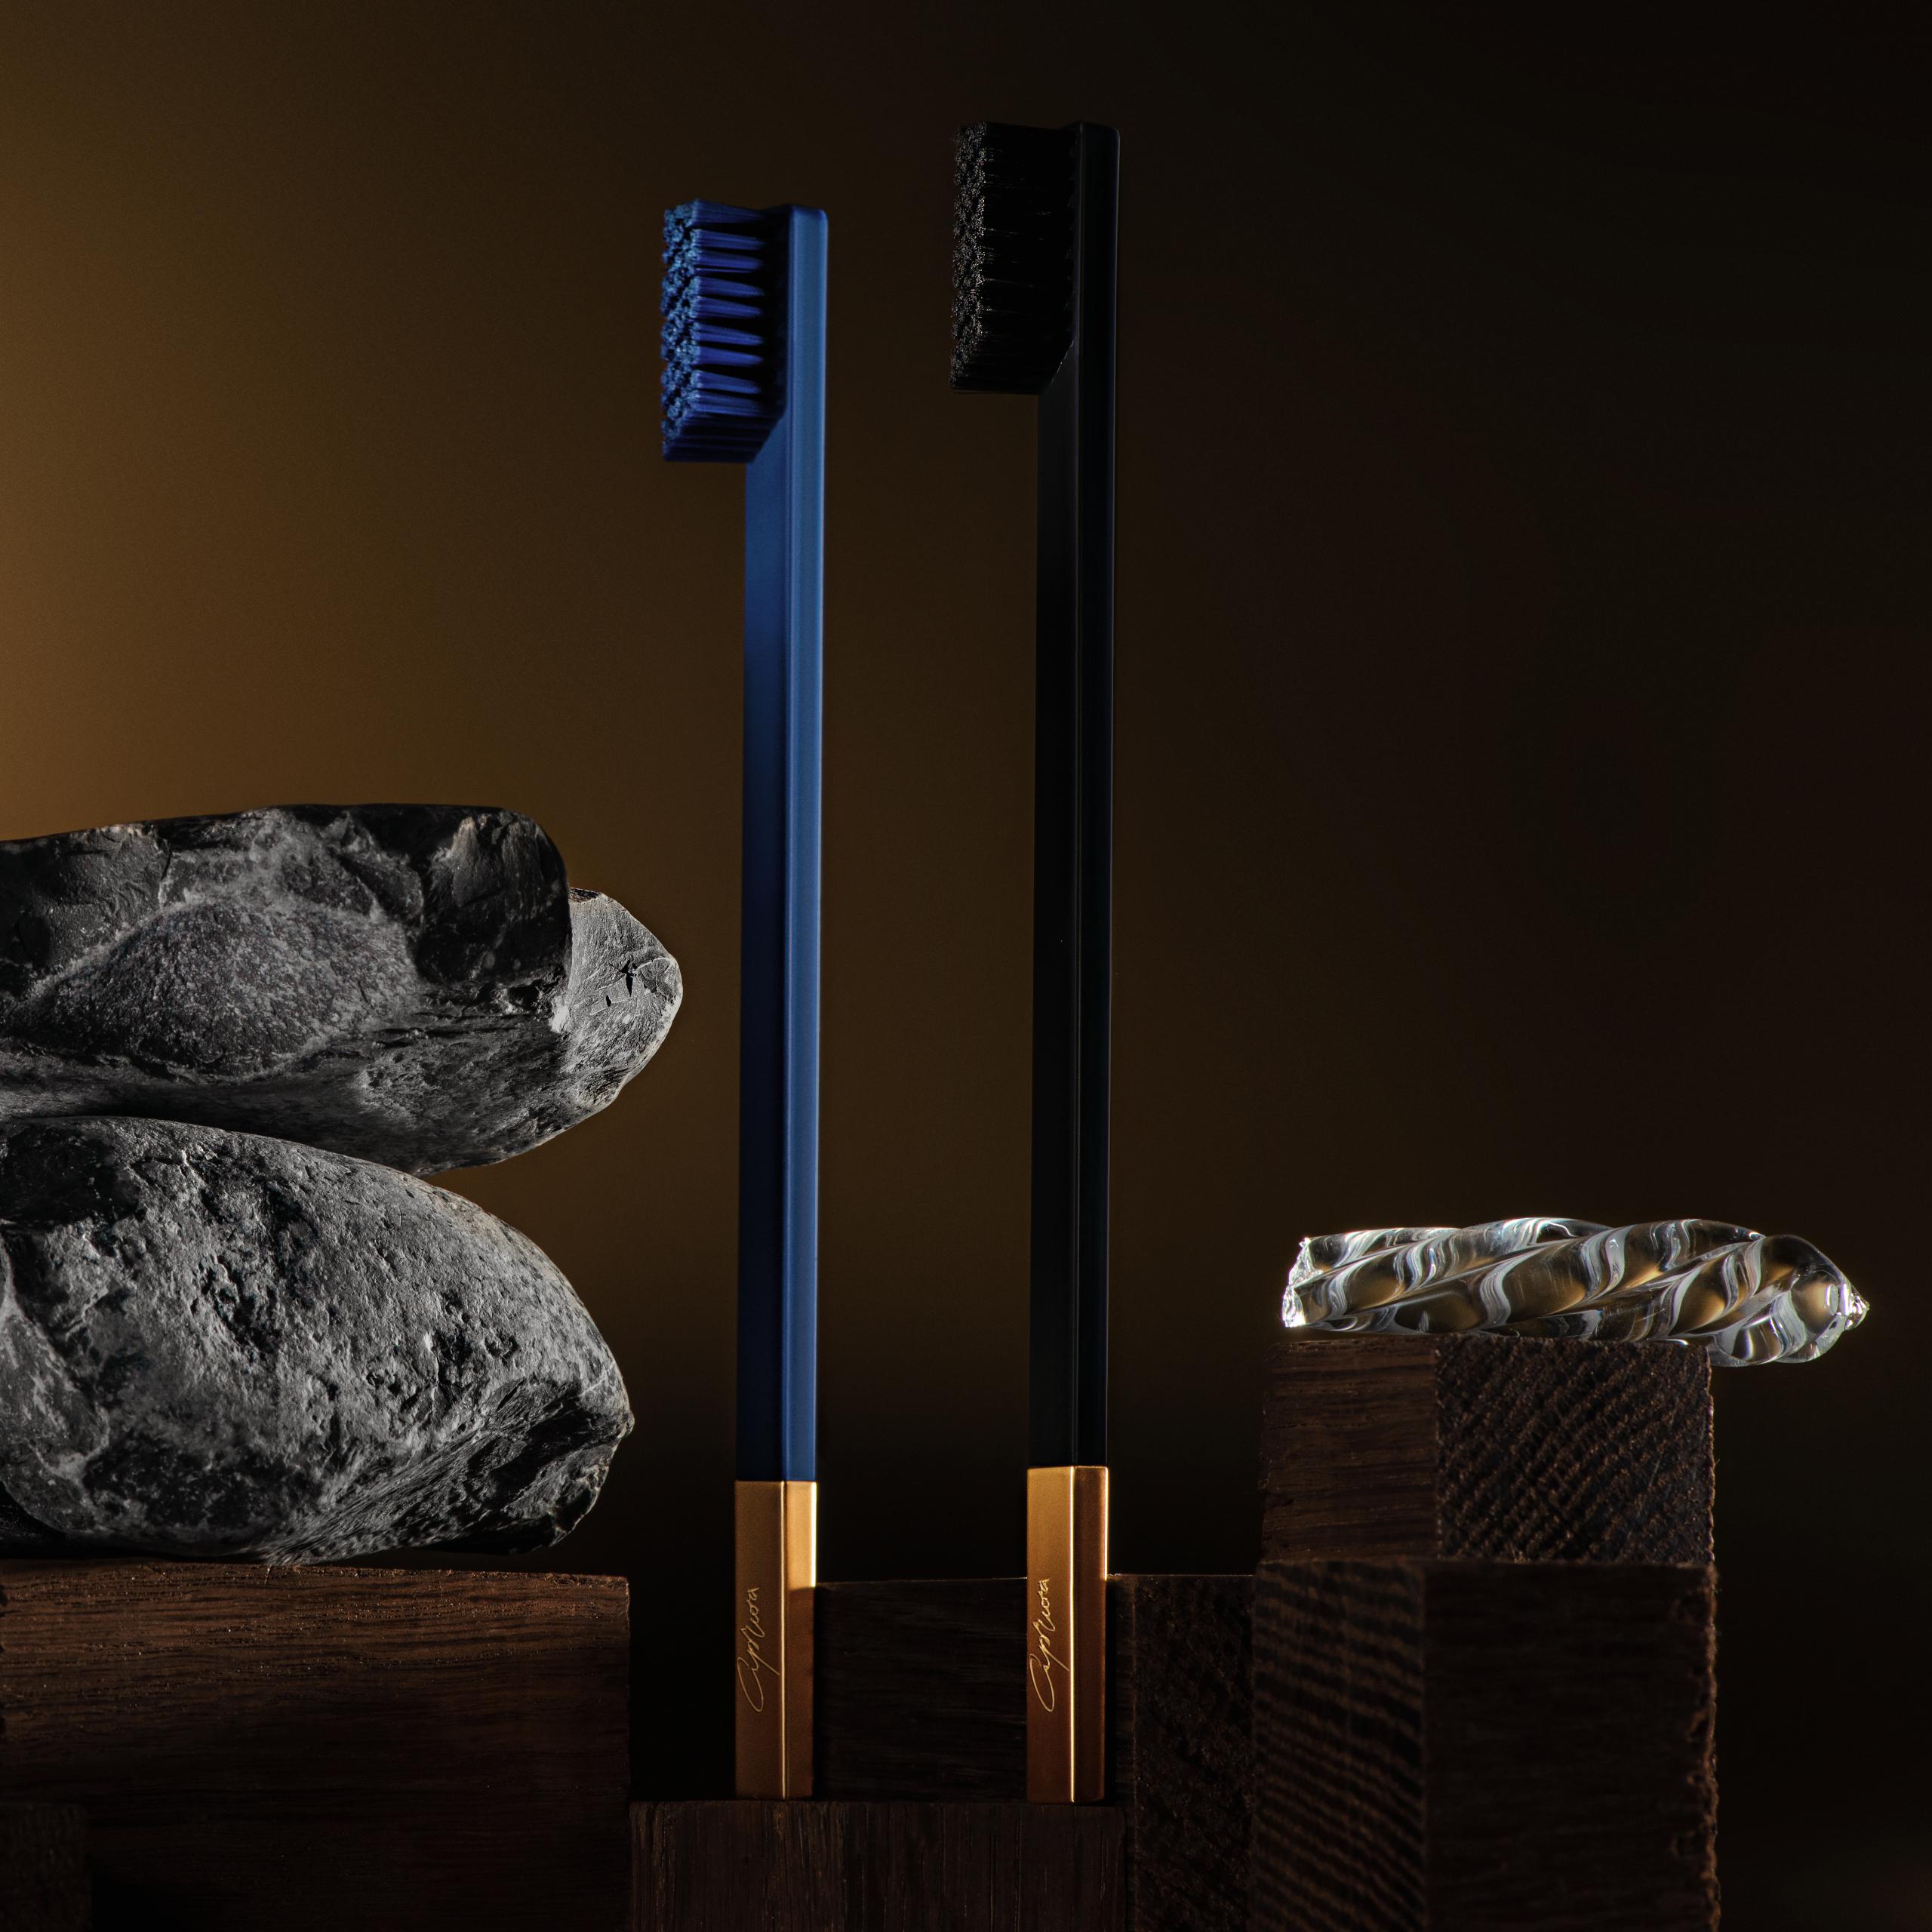 SLIM by Apriori sapphire & black designer toothbrushes